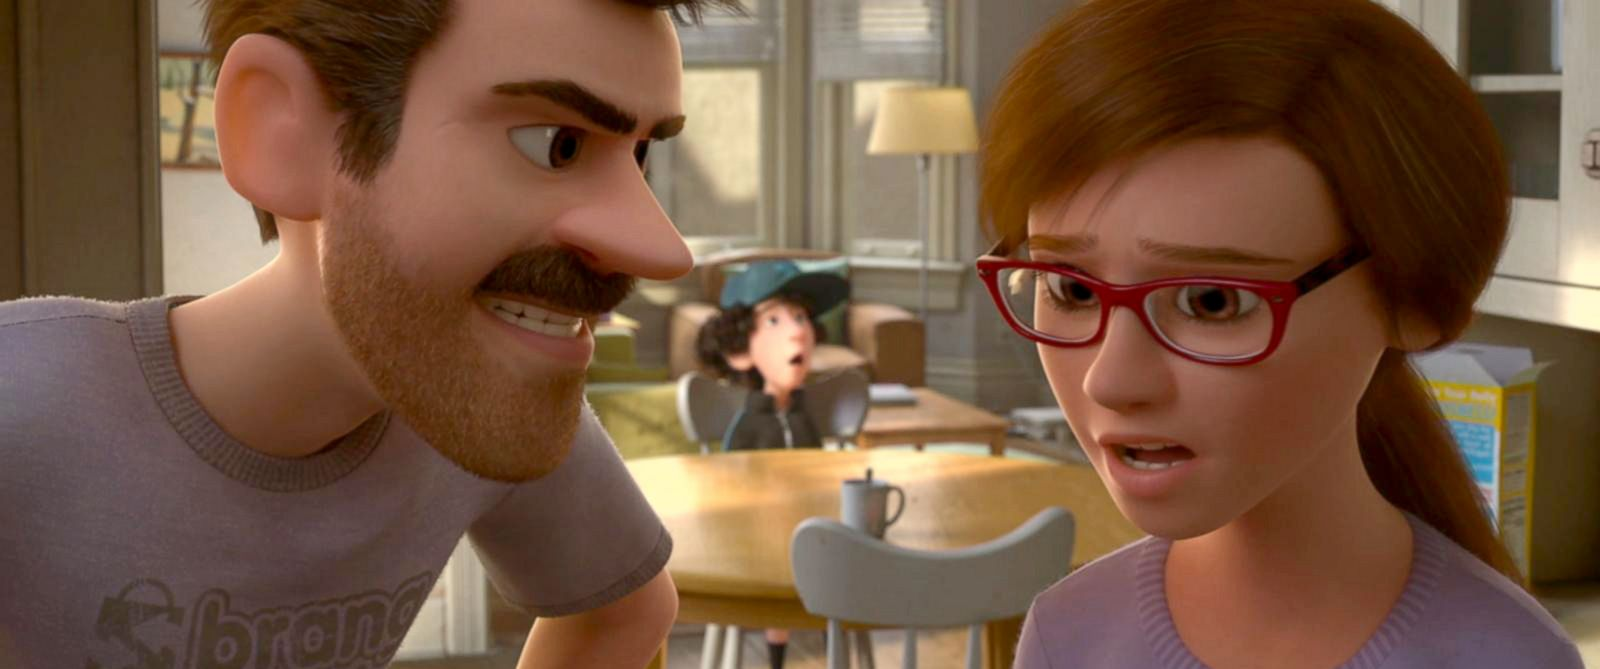 PHOTO: Heres an exclusive sneak peek at Disney-Pixars new animated short film, Rileys First Date.